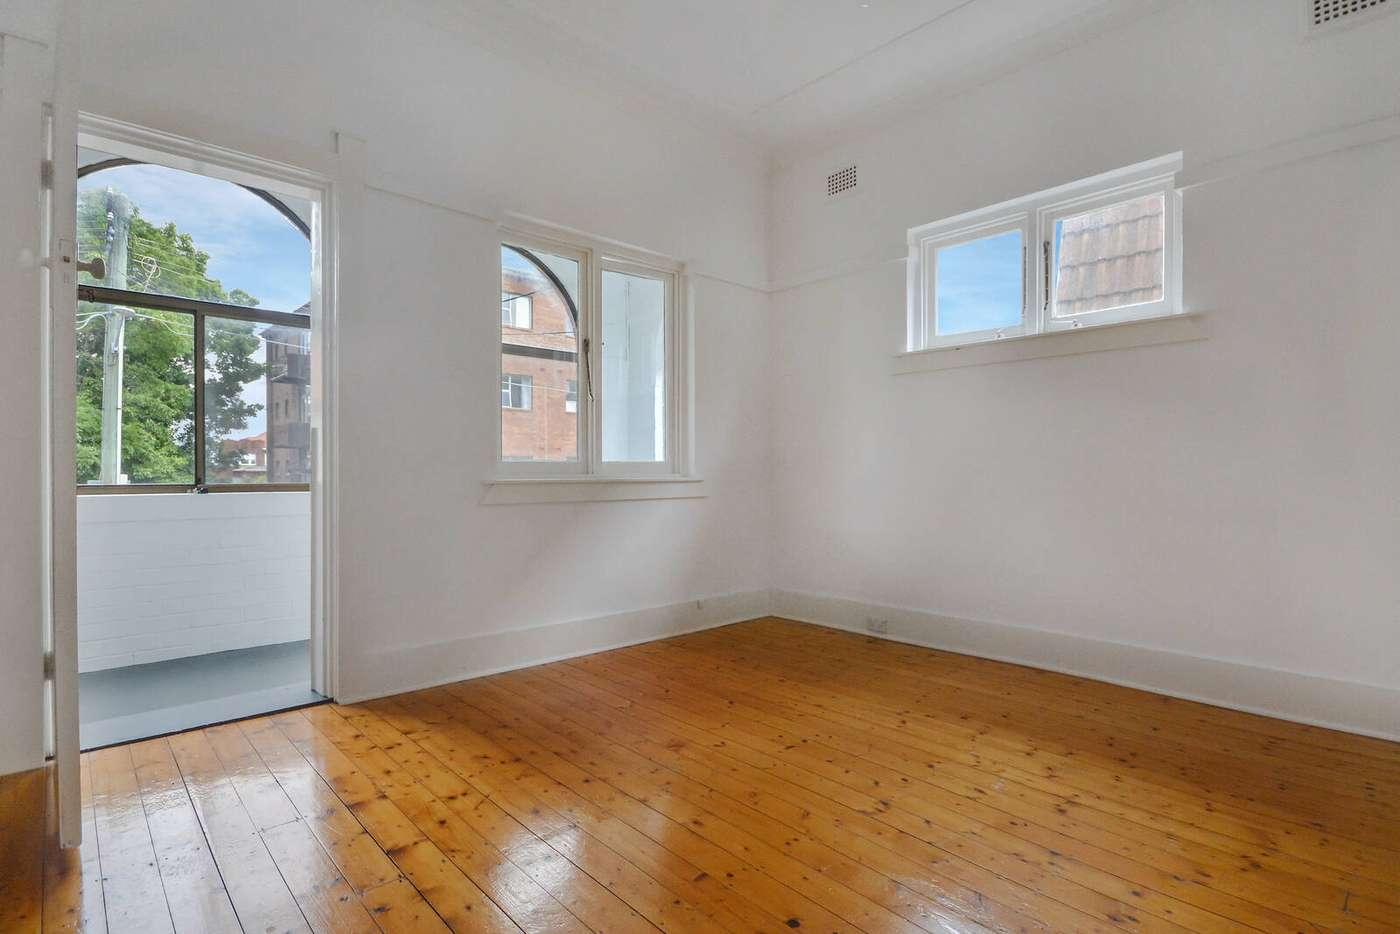 Main view of Homely apartment listing, 1/1 Ben Eden Street, Bondi Junction NSW 2022